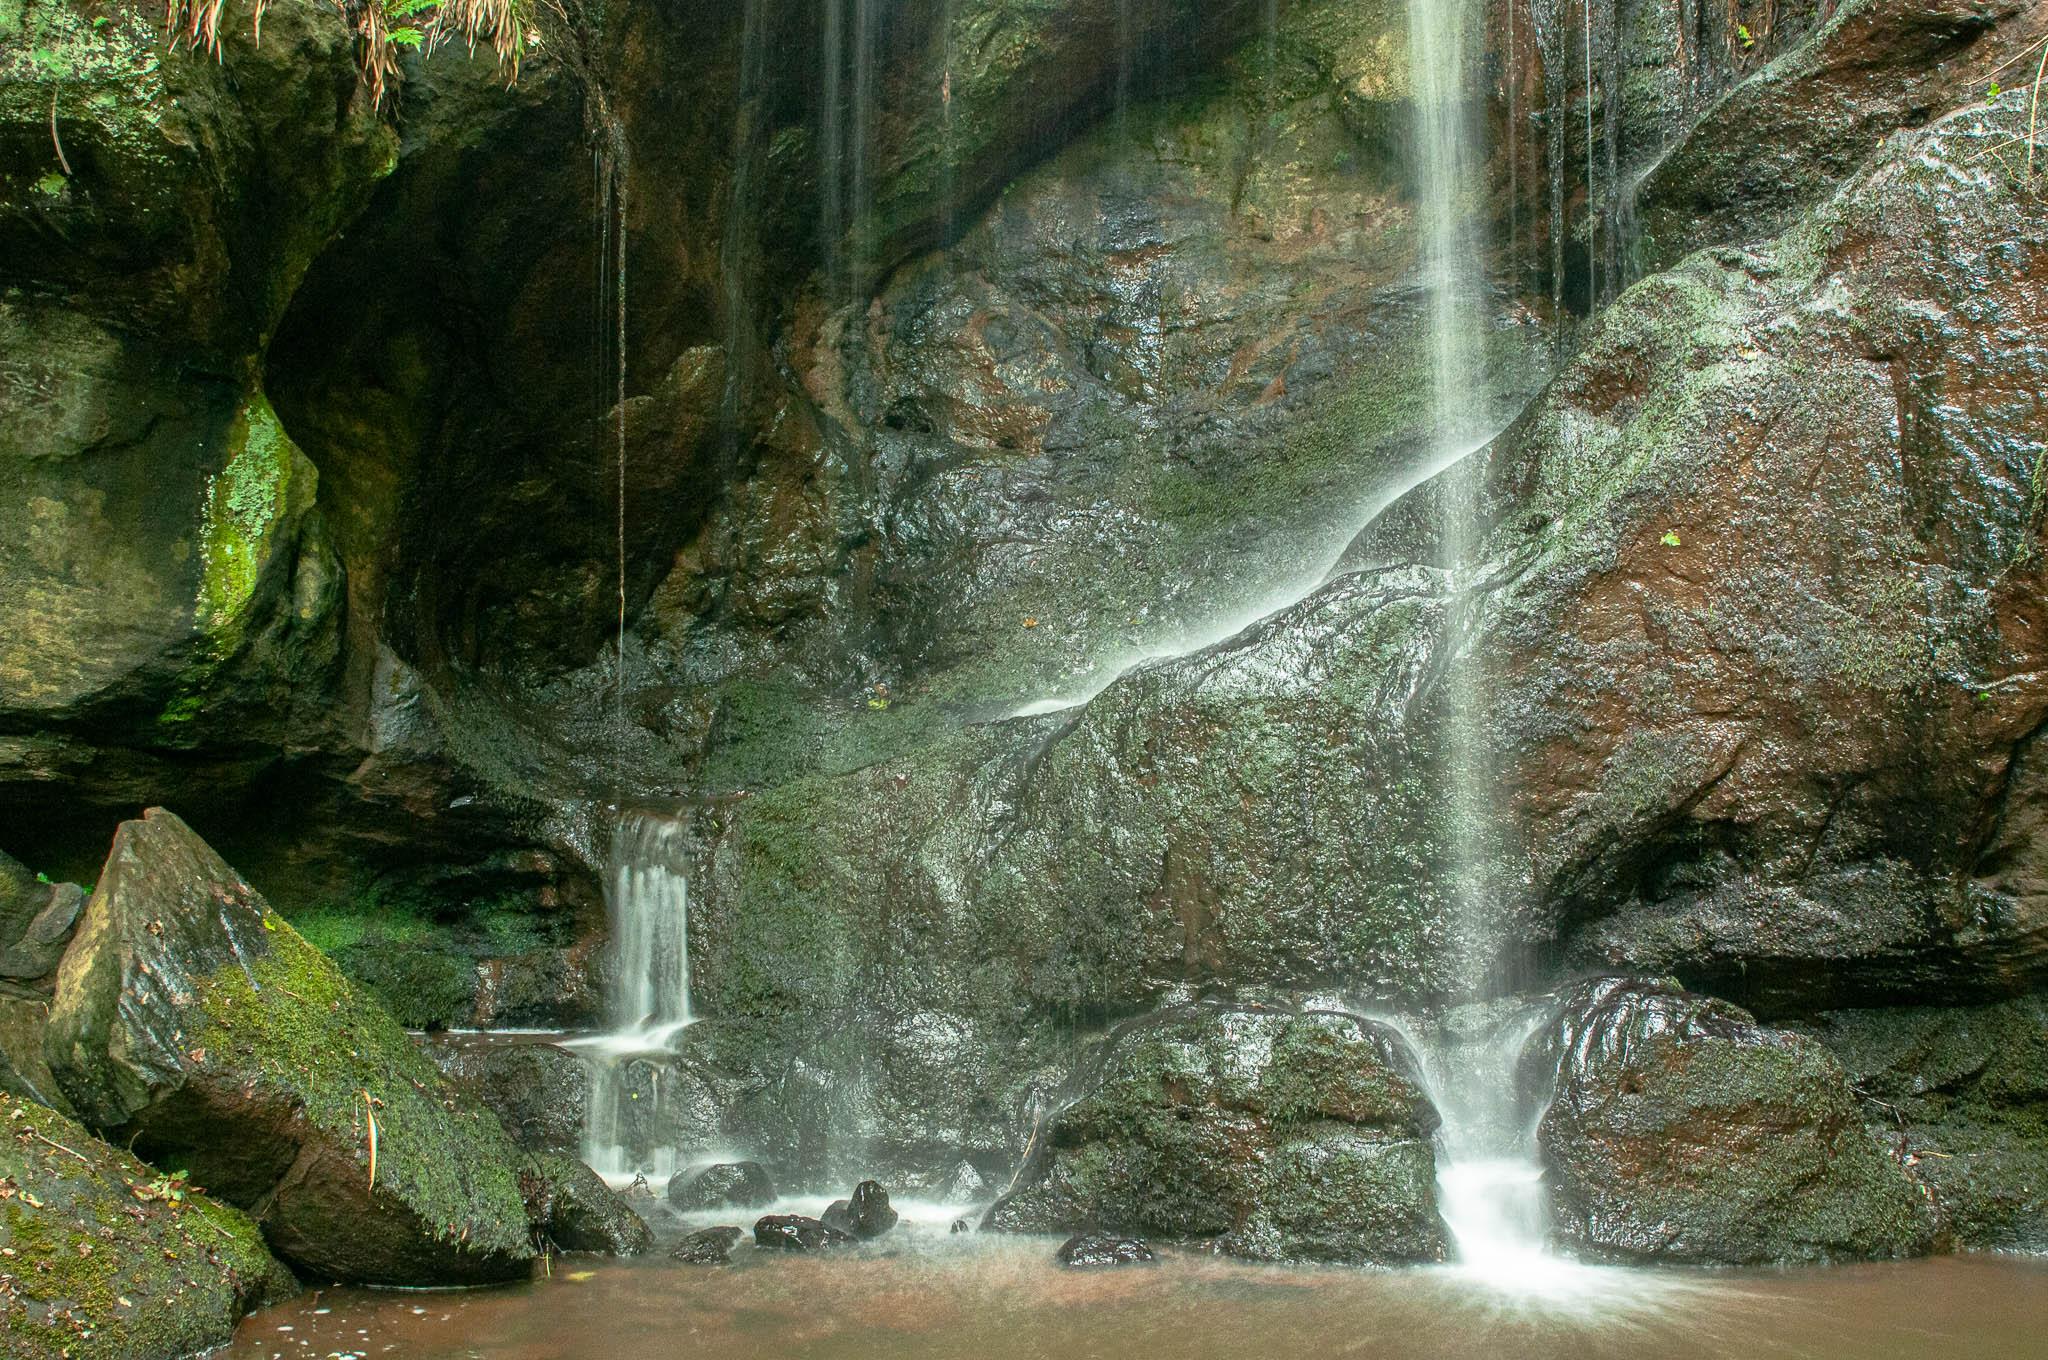 Routin Linn Waterfall, United Kingdom